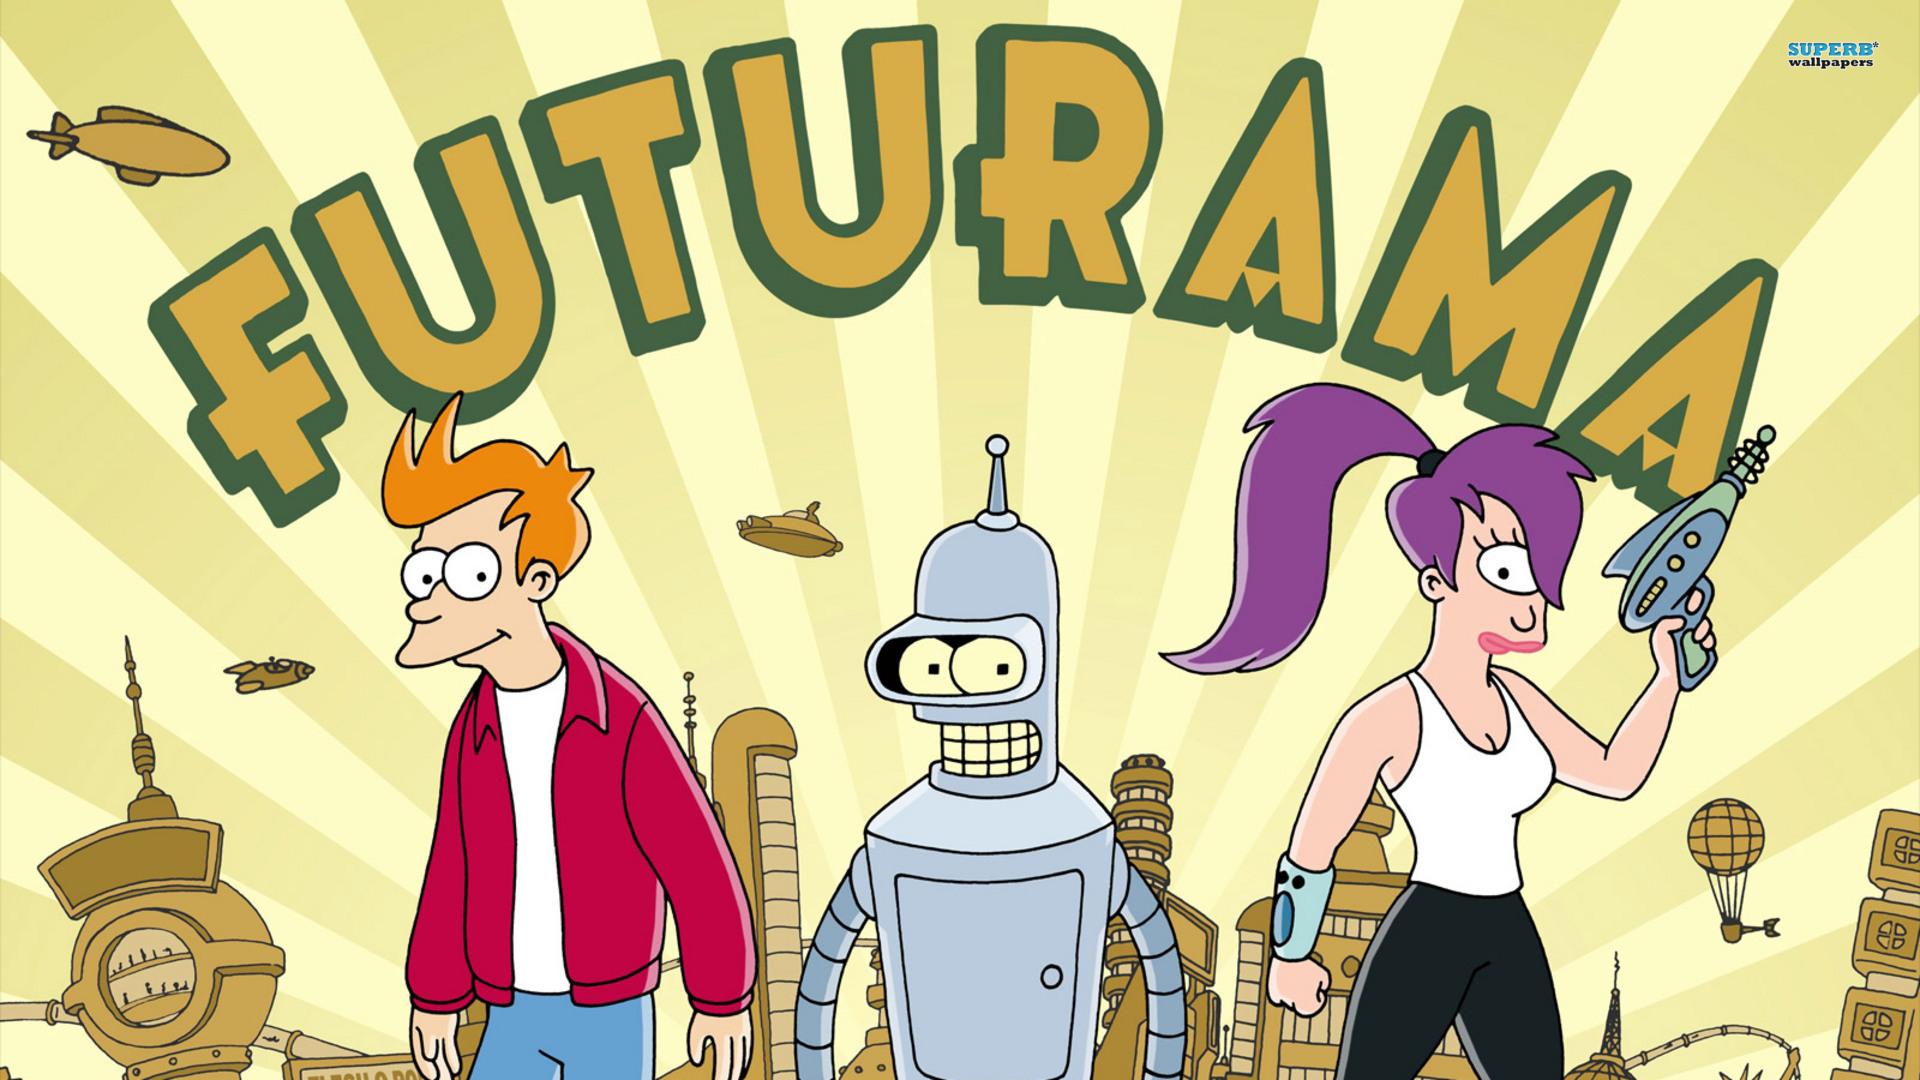 Futurama full hd wallpaper and background image - Futurama wallpaper ...